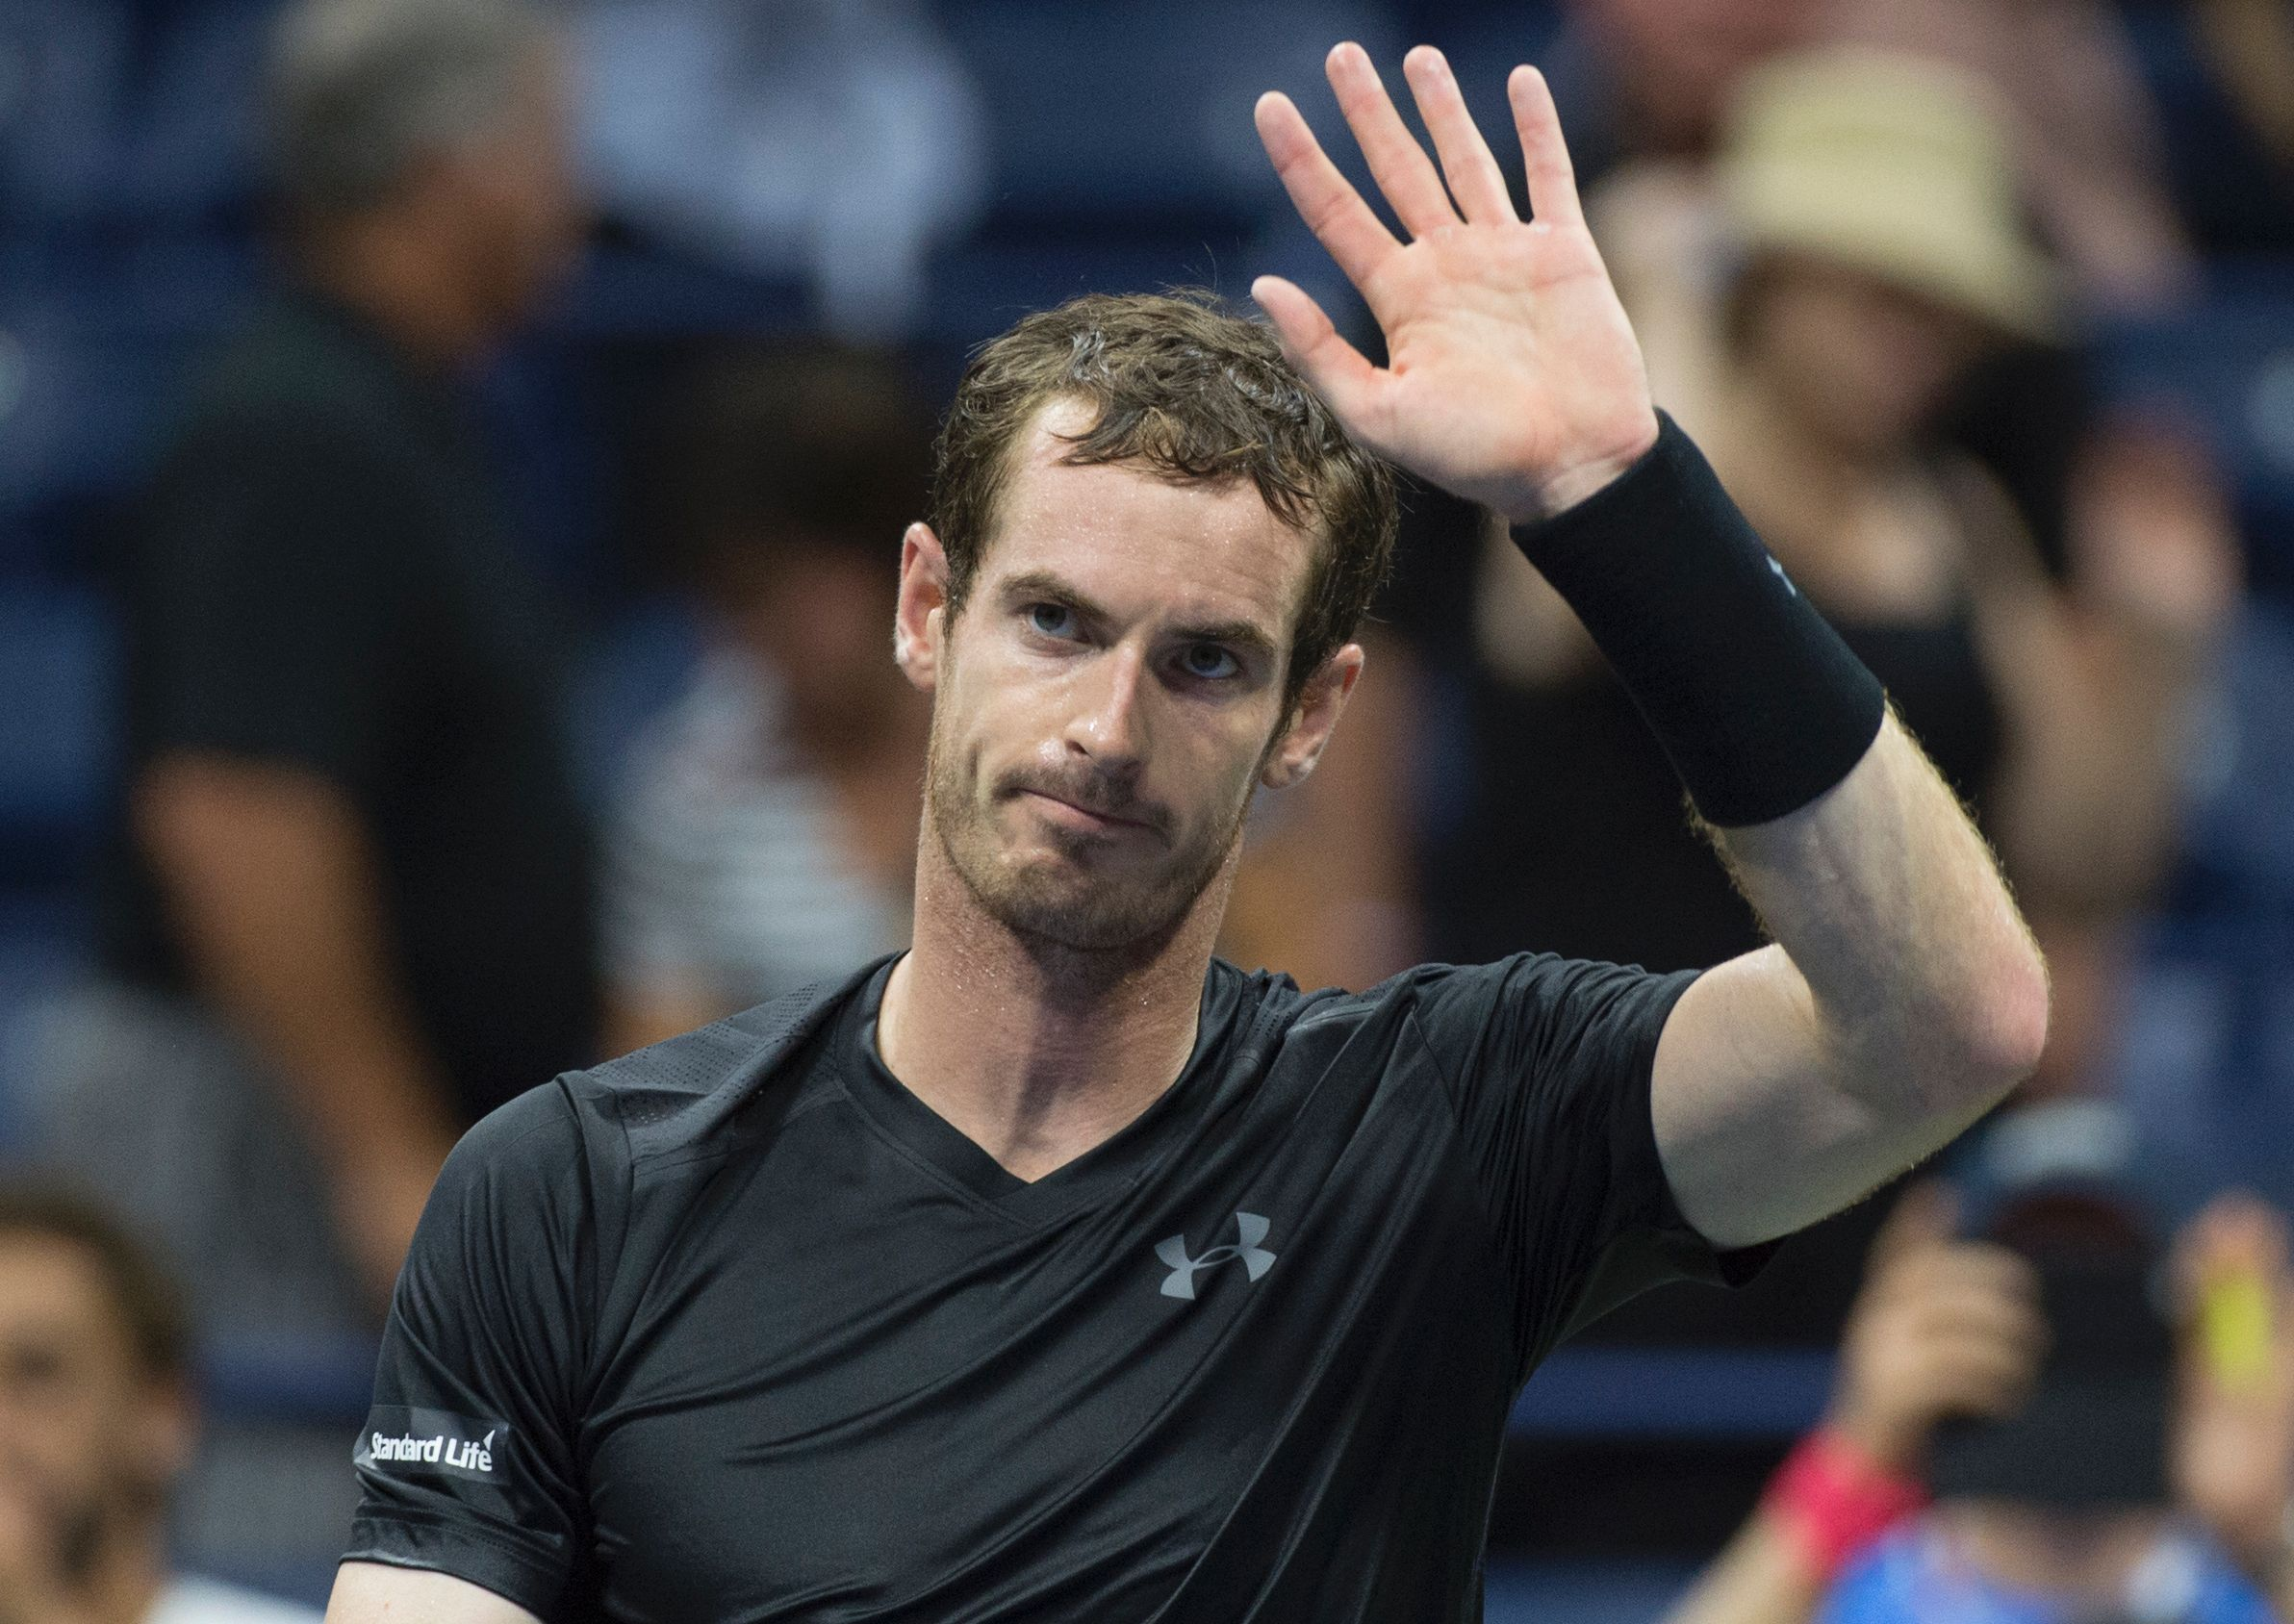 Tennis : US Open - Murray et Simon faciles, un record pour Karlovic